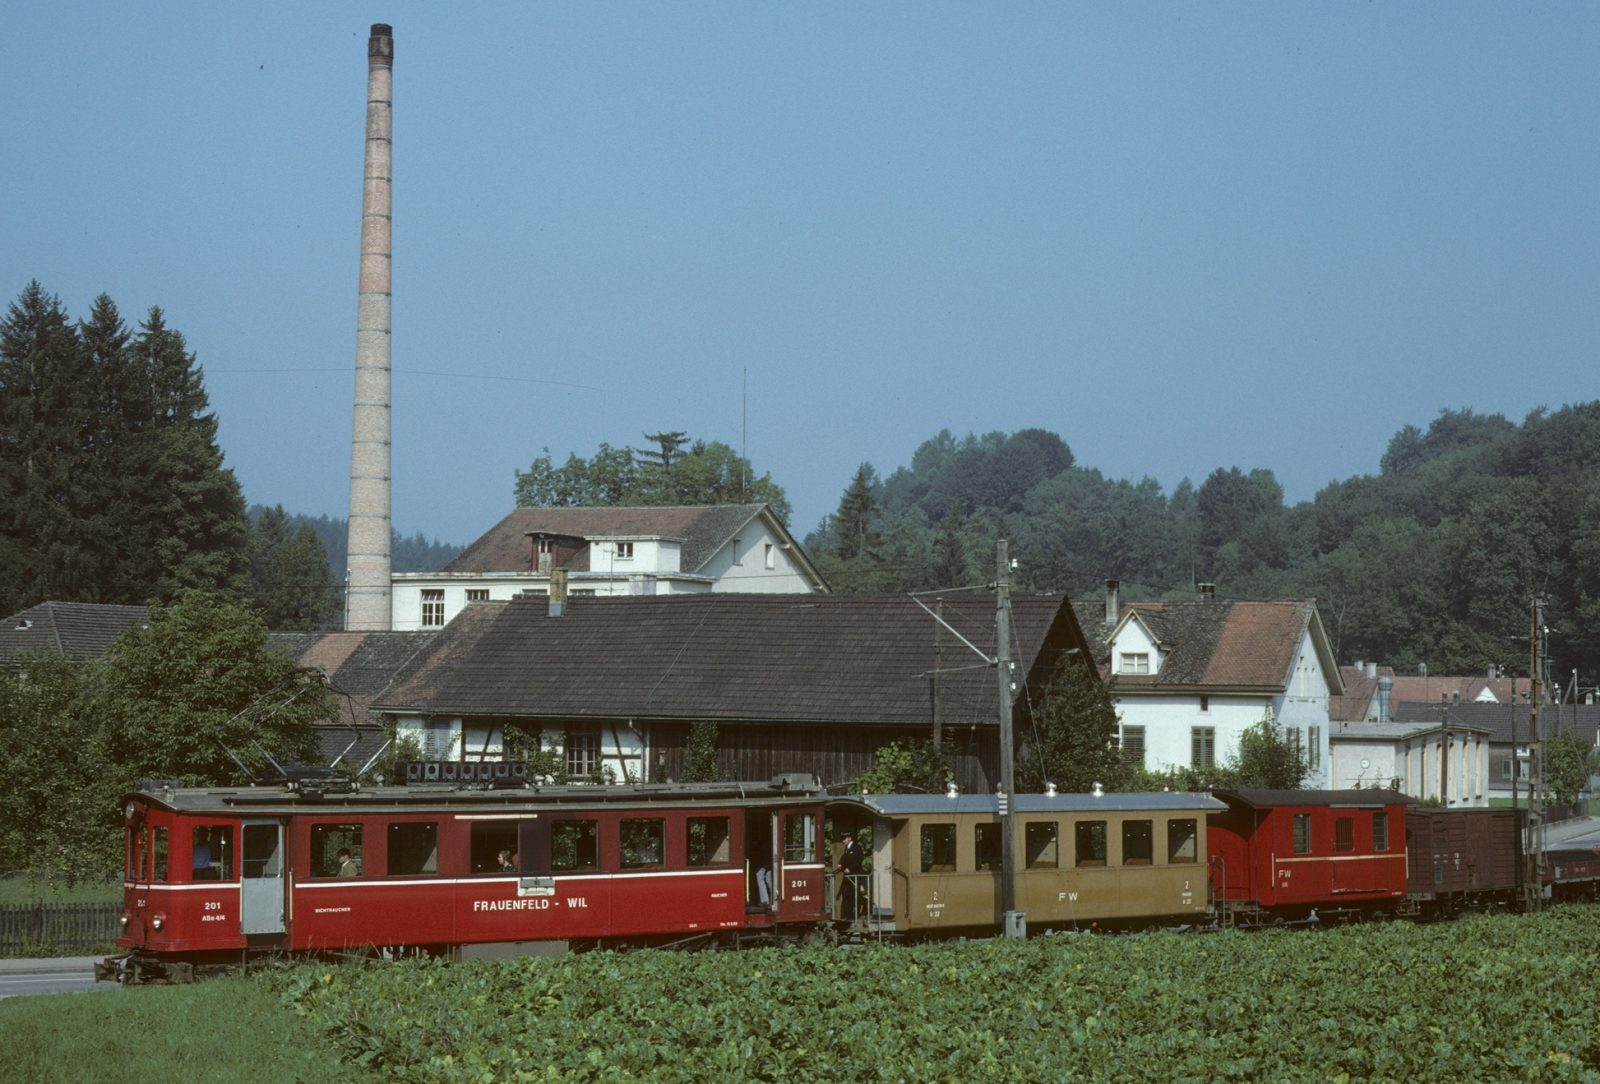 Frauenfeld Wil Bahn Murkart